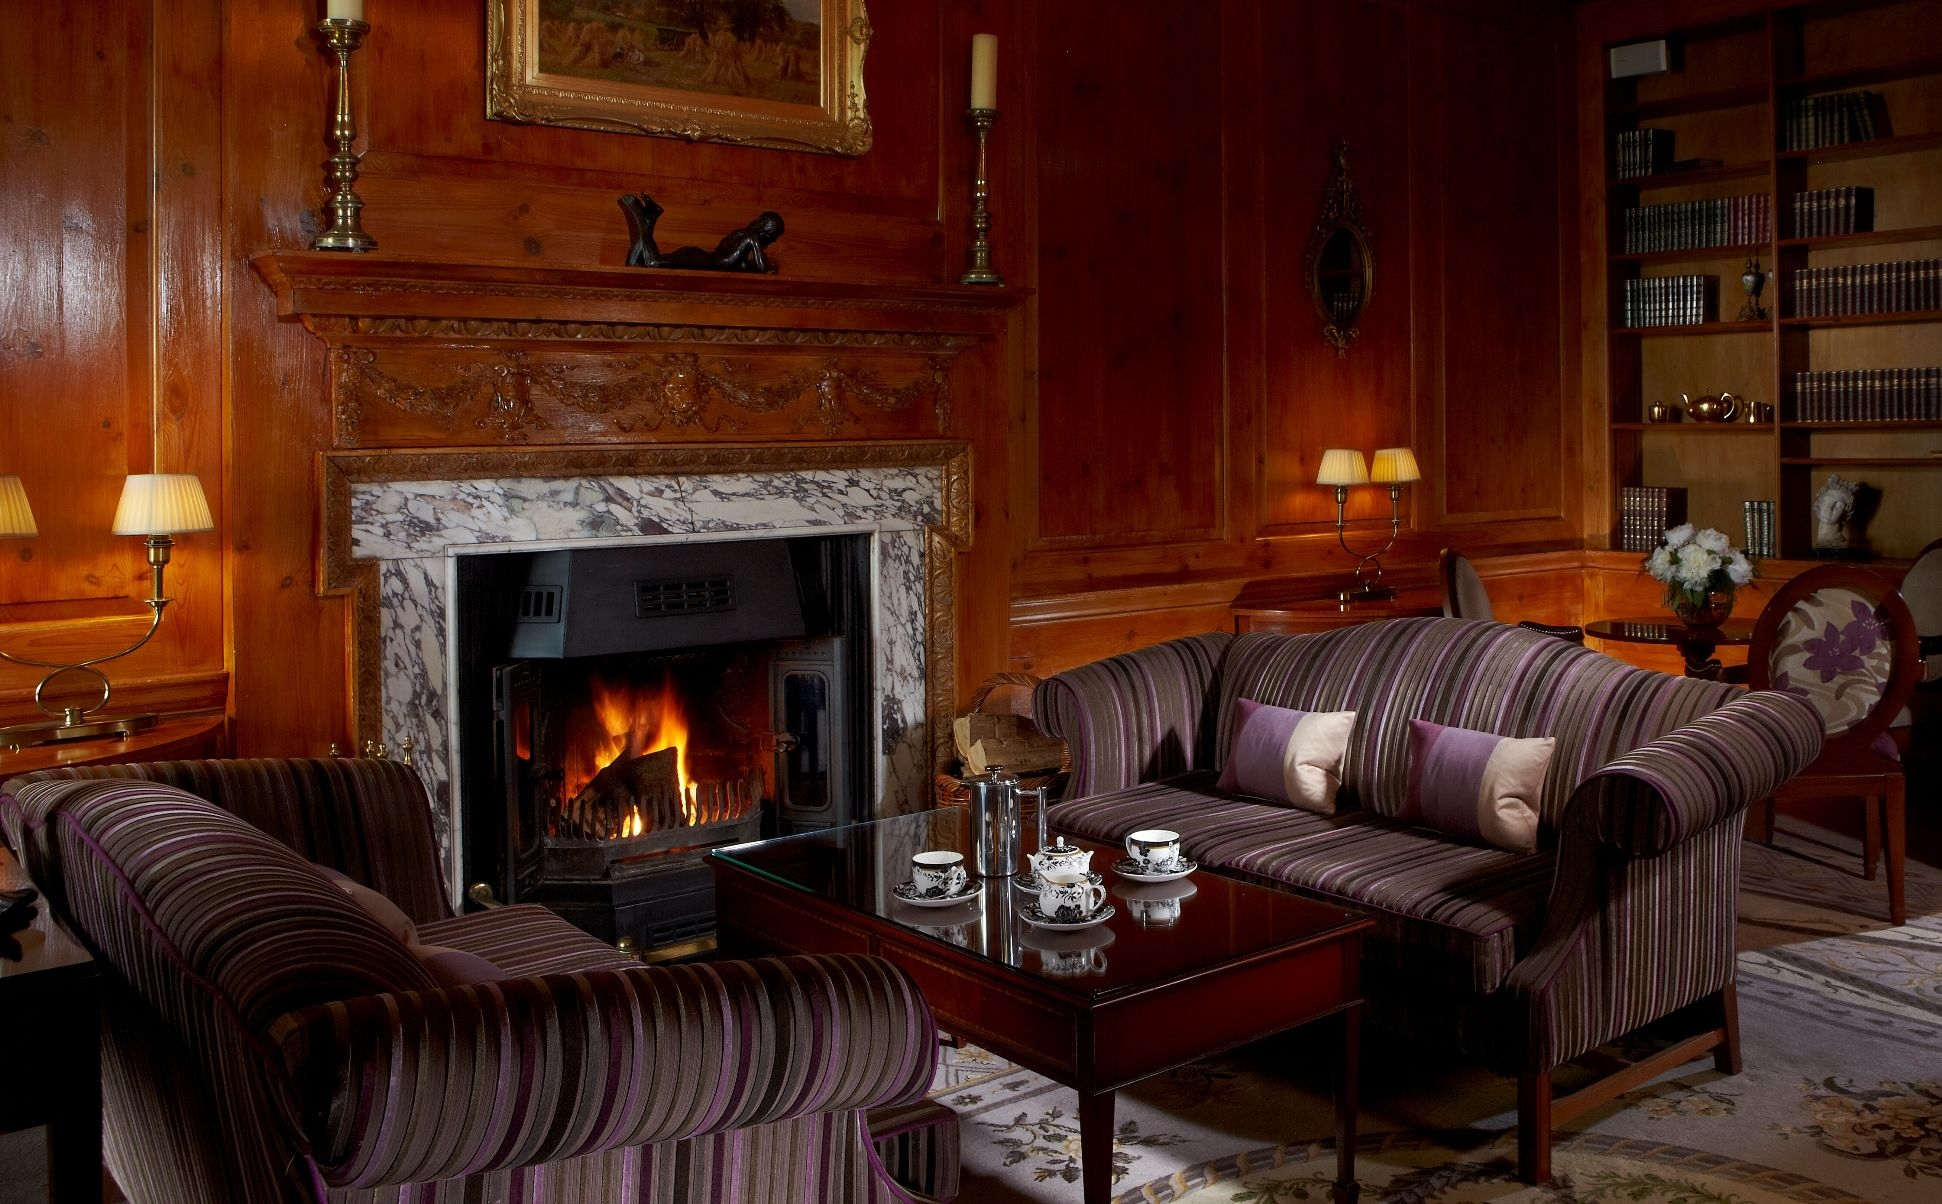 Eden Hotels-Brockencote Hall-12-06-12 10303 lr.jpg